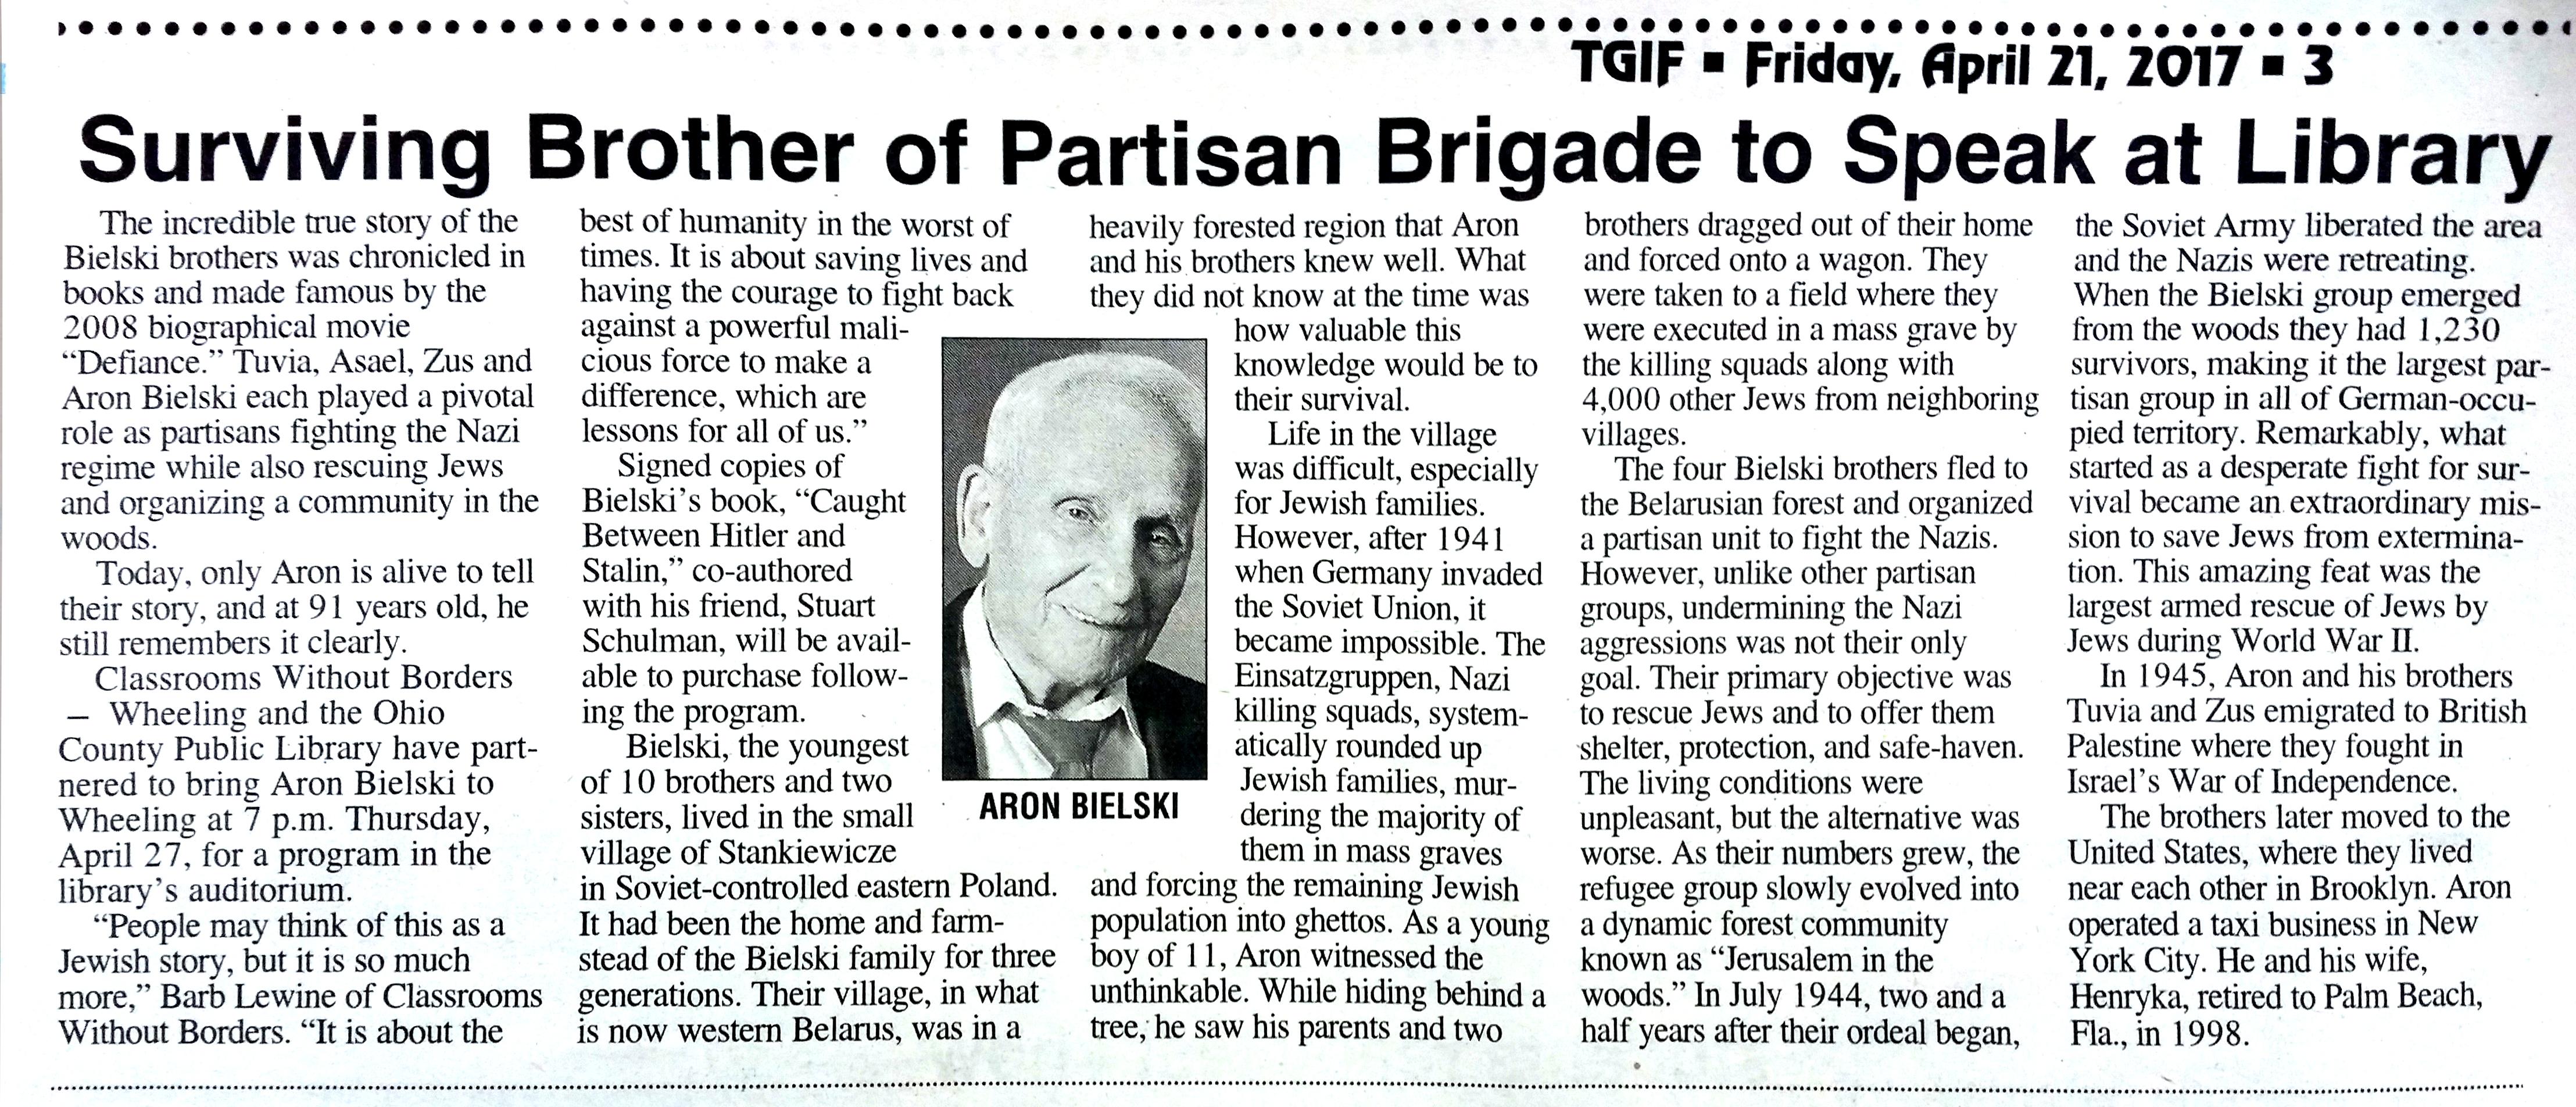 TGIF article: Aron Bielski at Library, Thursday, April 27, 2017